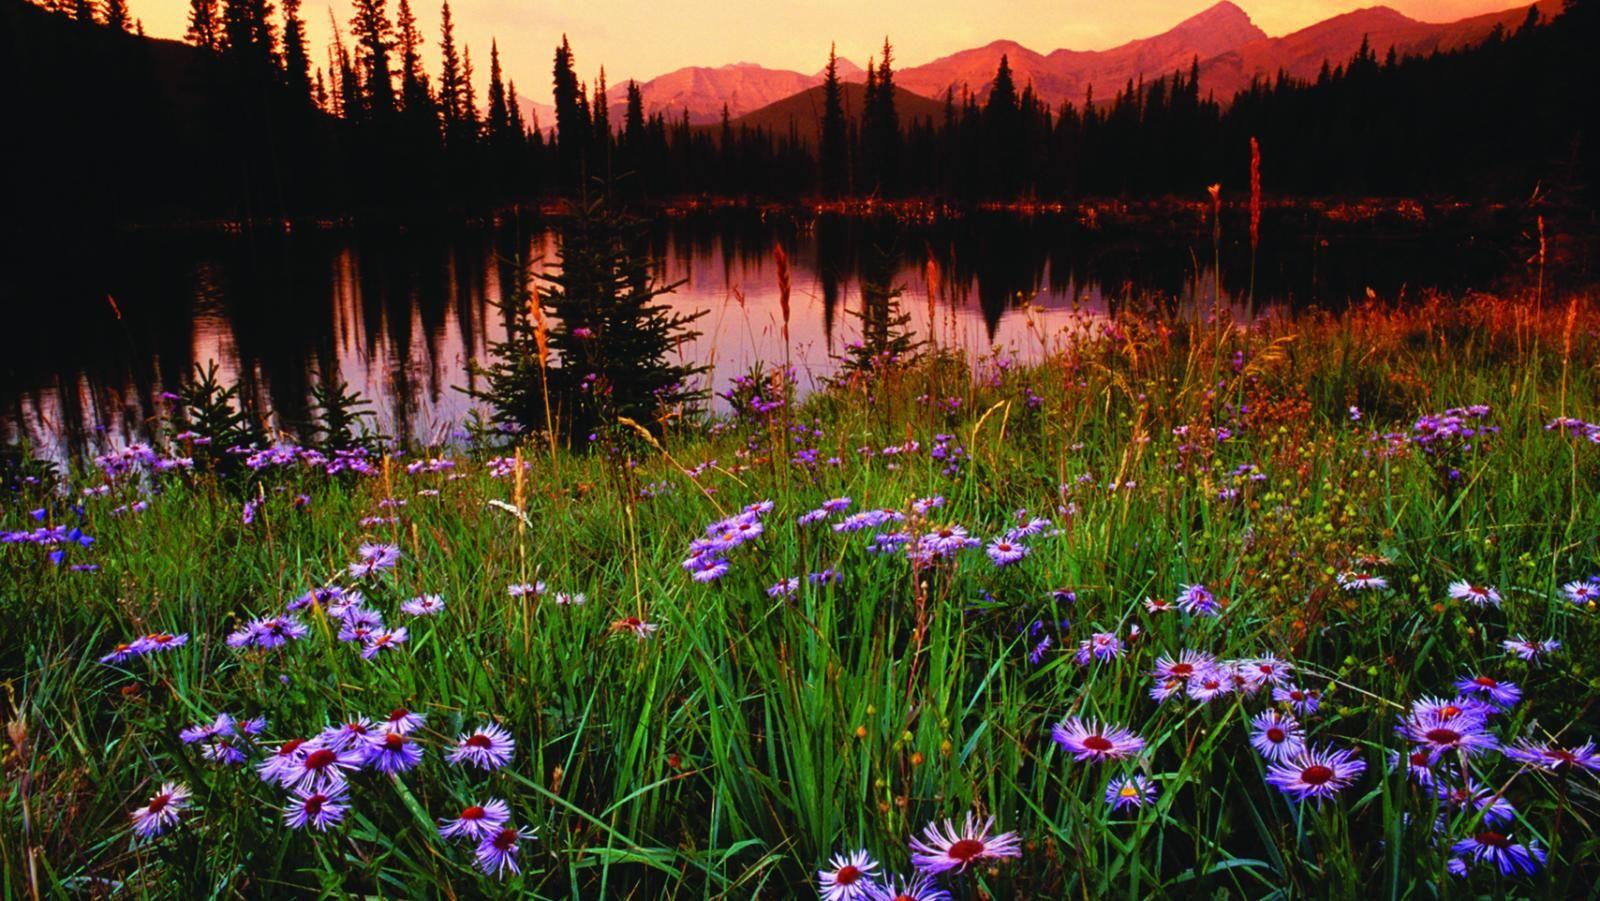 Mountain Lake & Meadow   Winter park colorado, Winter park ...